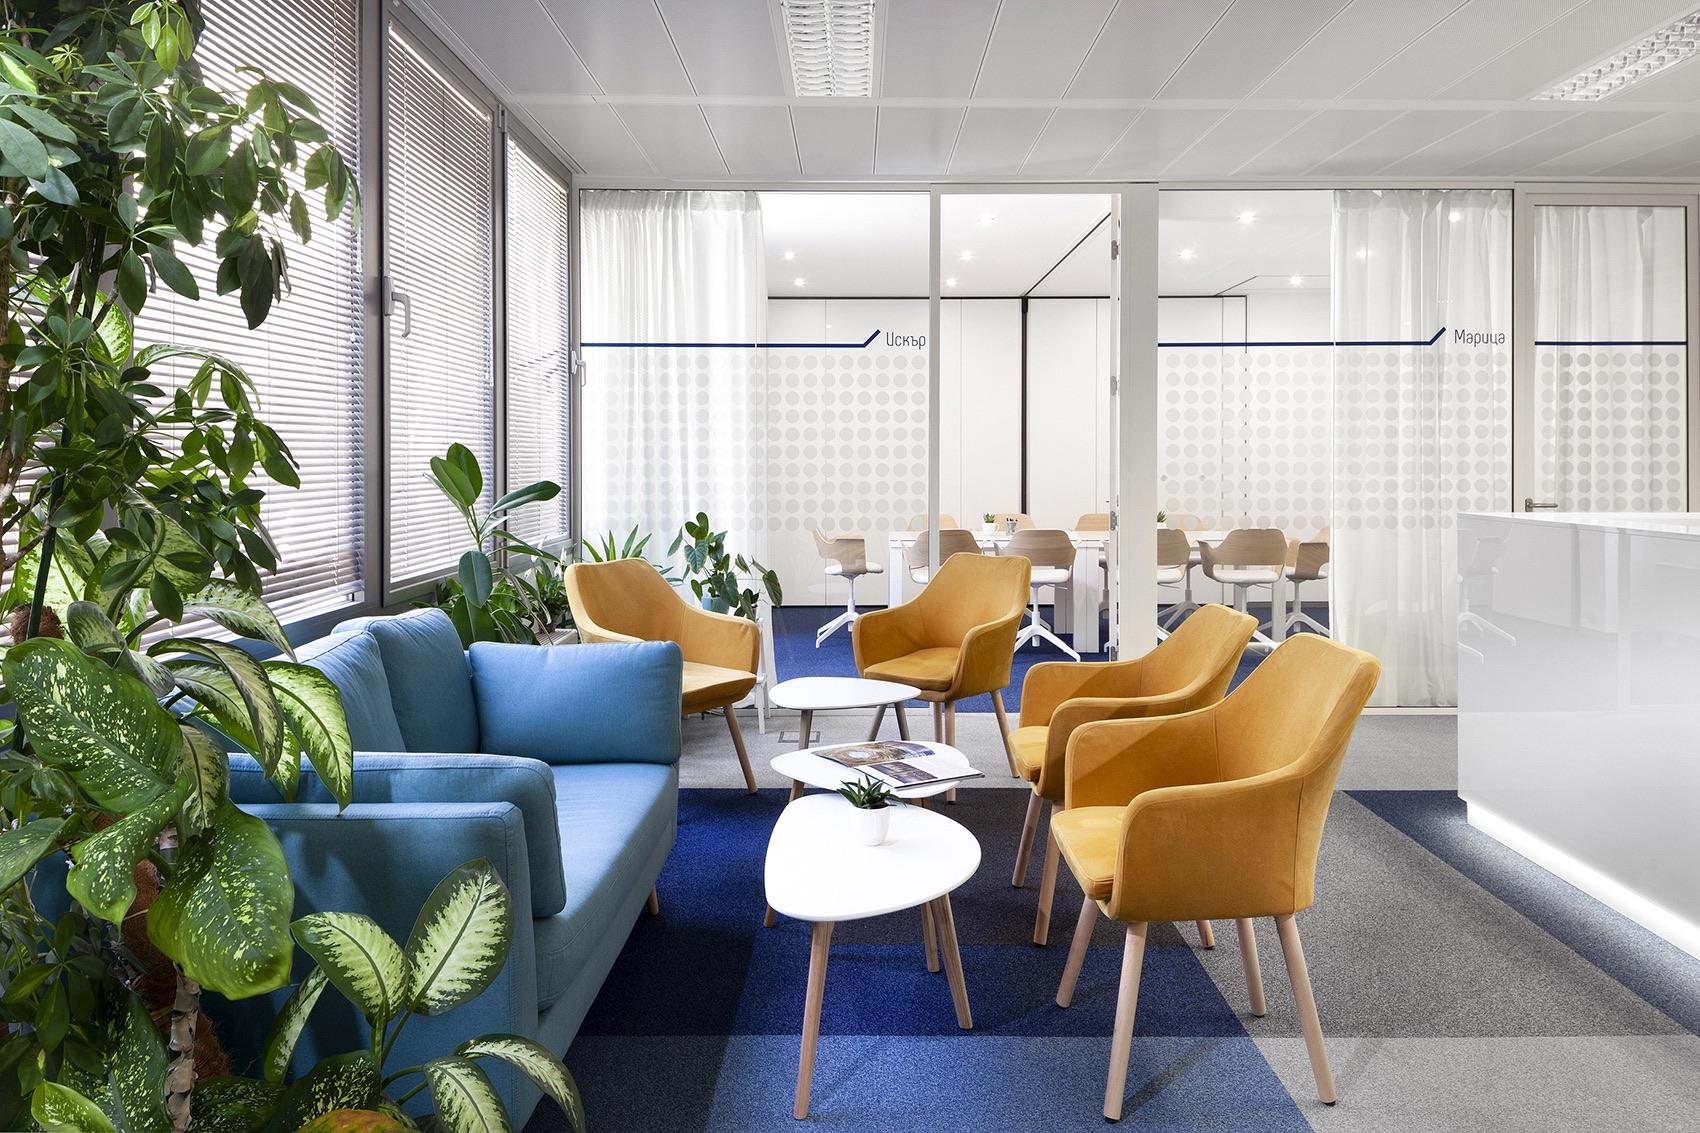 A Look Inside Porsche Finance Group's Minimalist Sofia Office